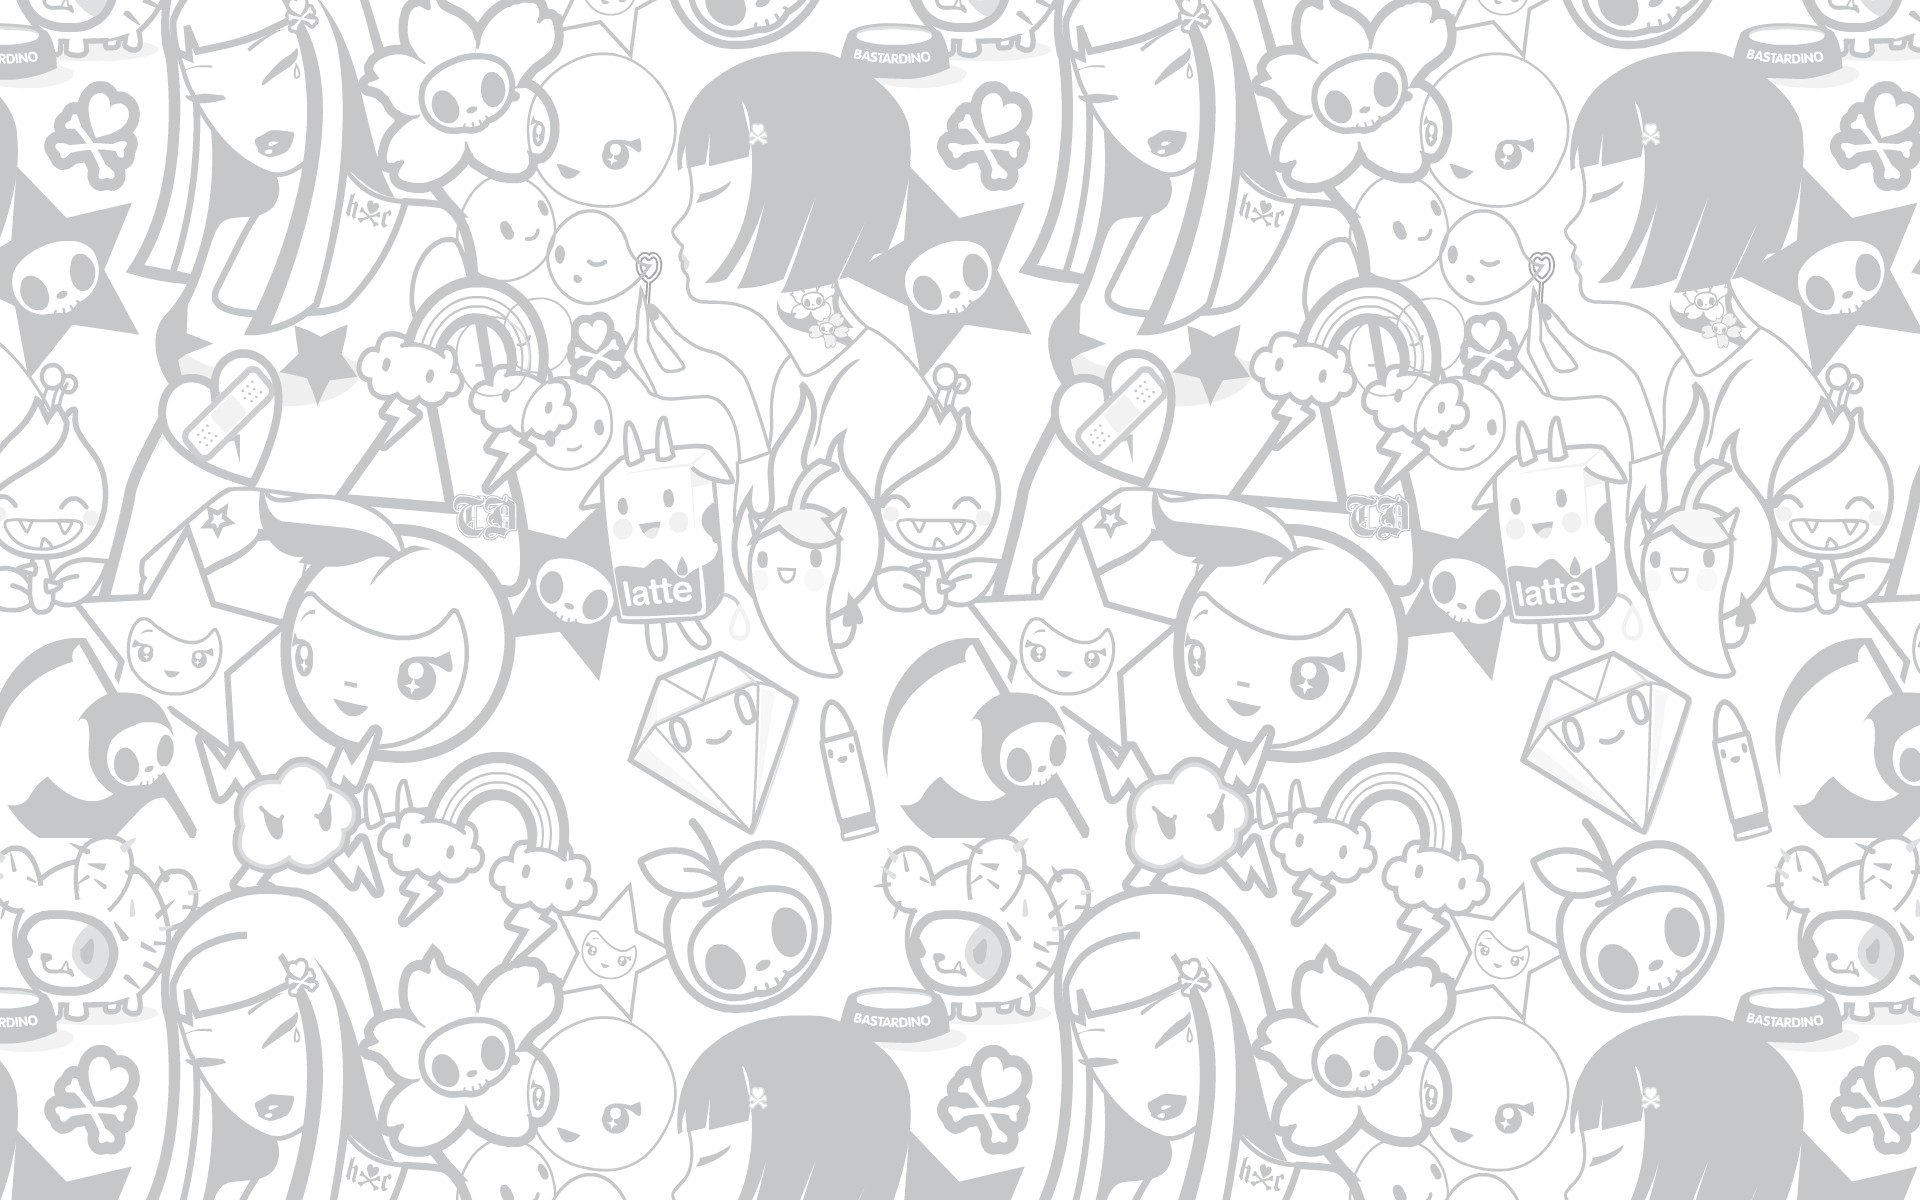 Hd wallpaper kawaii - Kawaii Wallpaper 1920 1200 25774 Hd Wallpaper Res 1920x1200